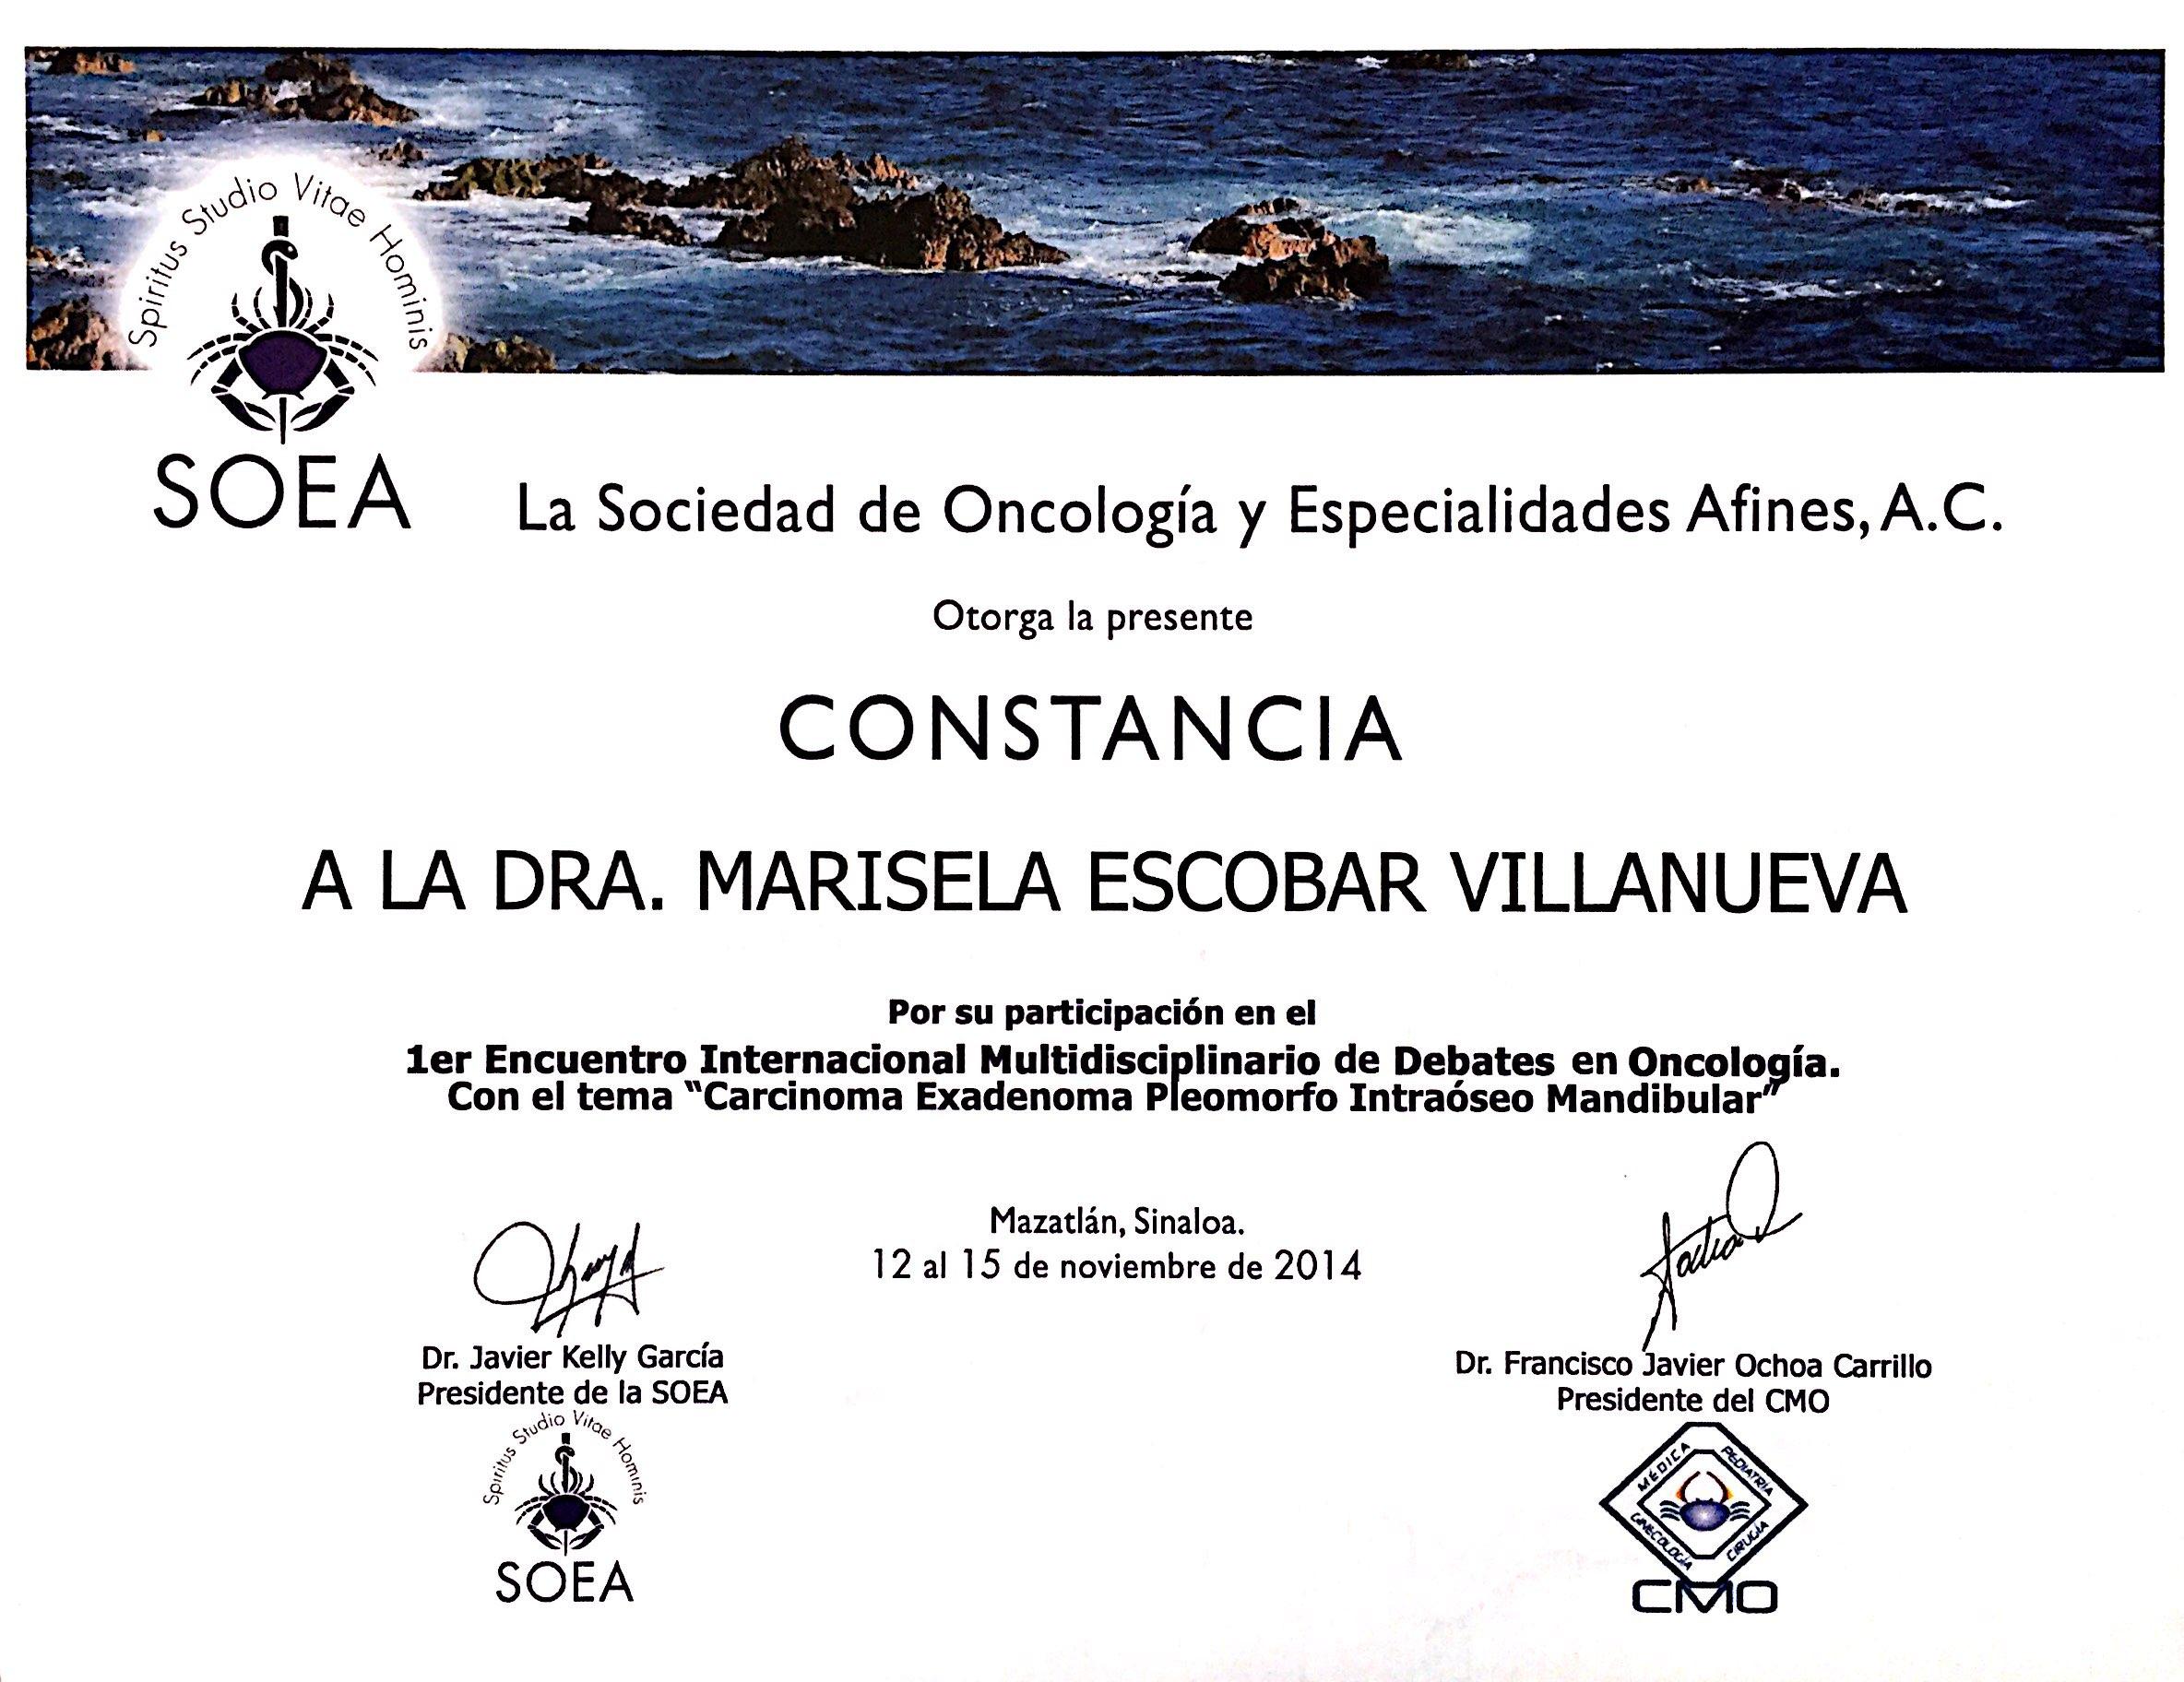 Nuevo doc 2018-02-20 11.21.39_10